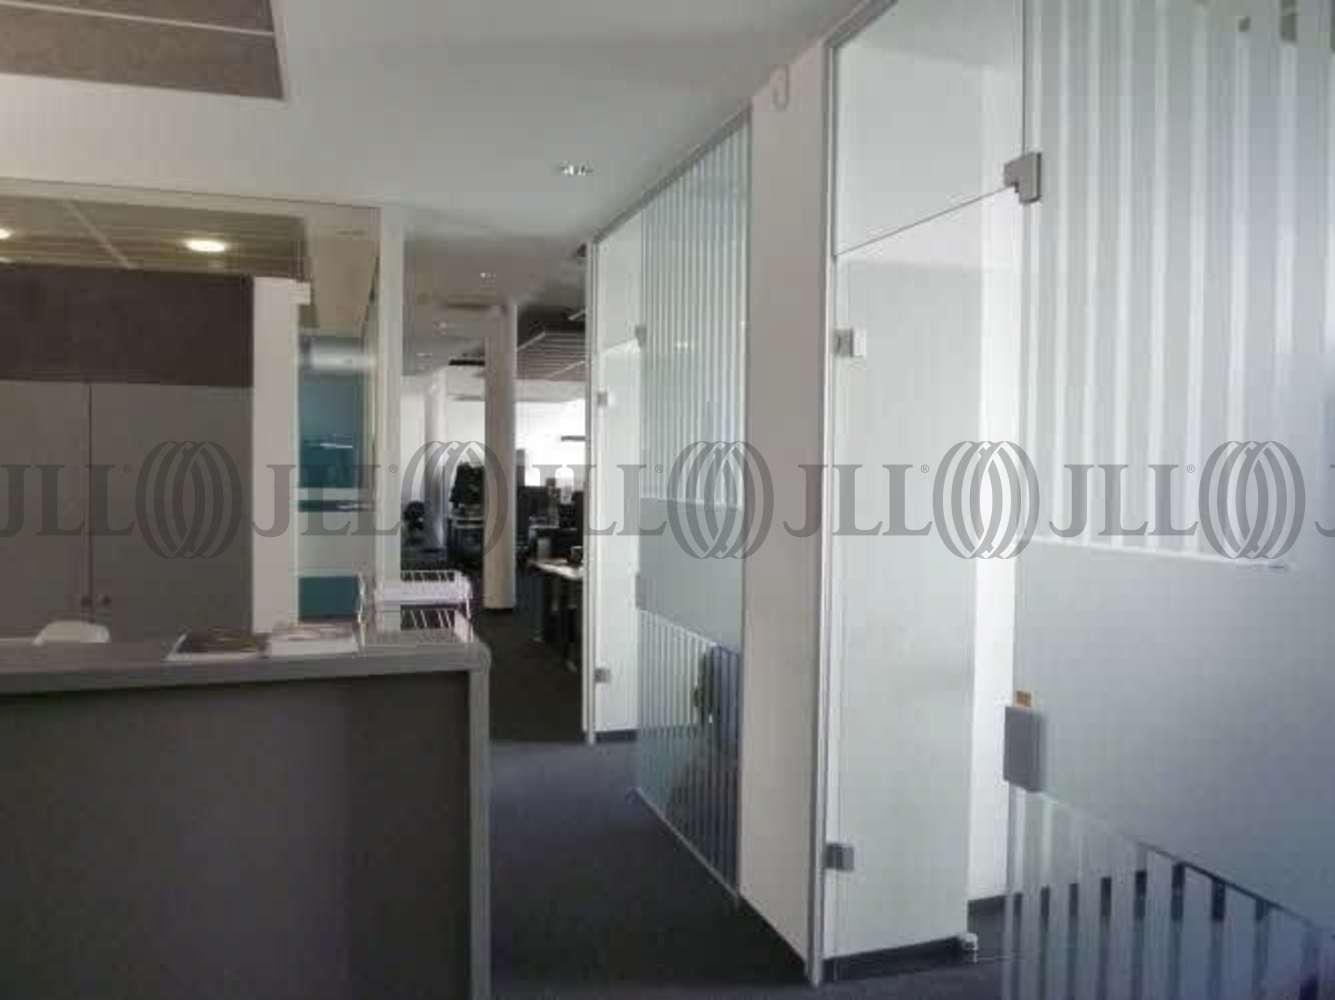 Büros Frankfurt am main, 60314 - Büro - Frankfurt am Main, Ostend - F1313 - 10912631